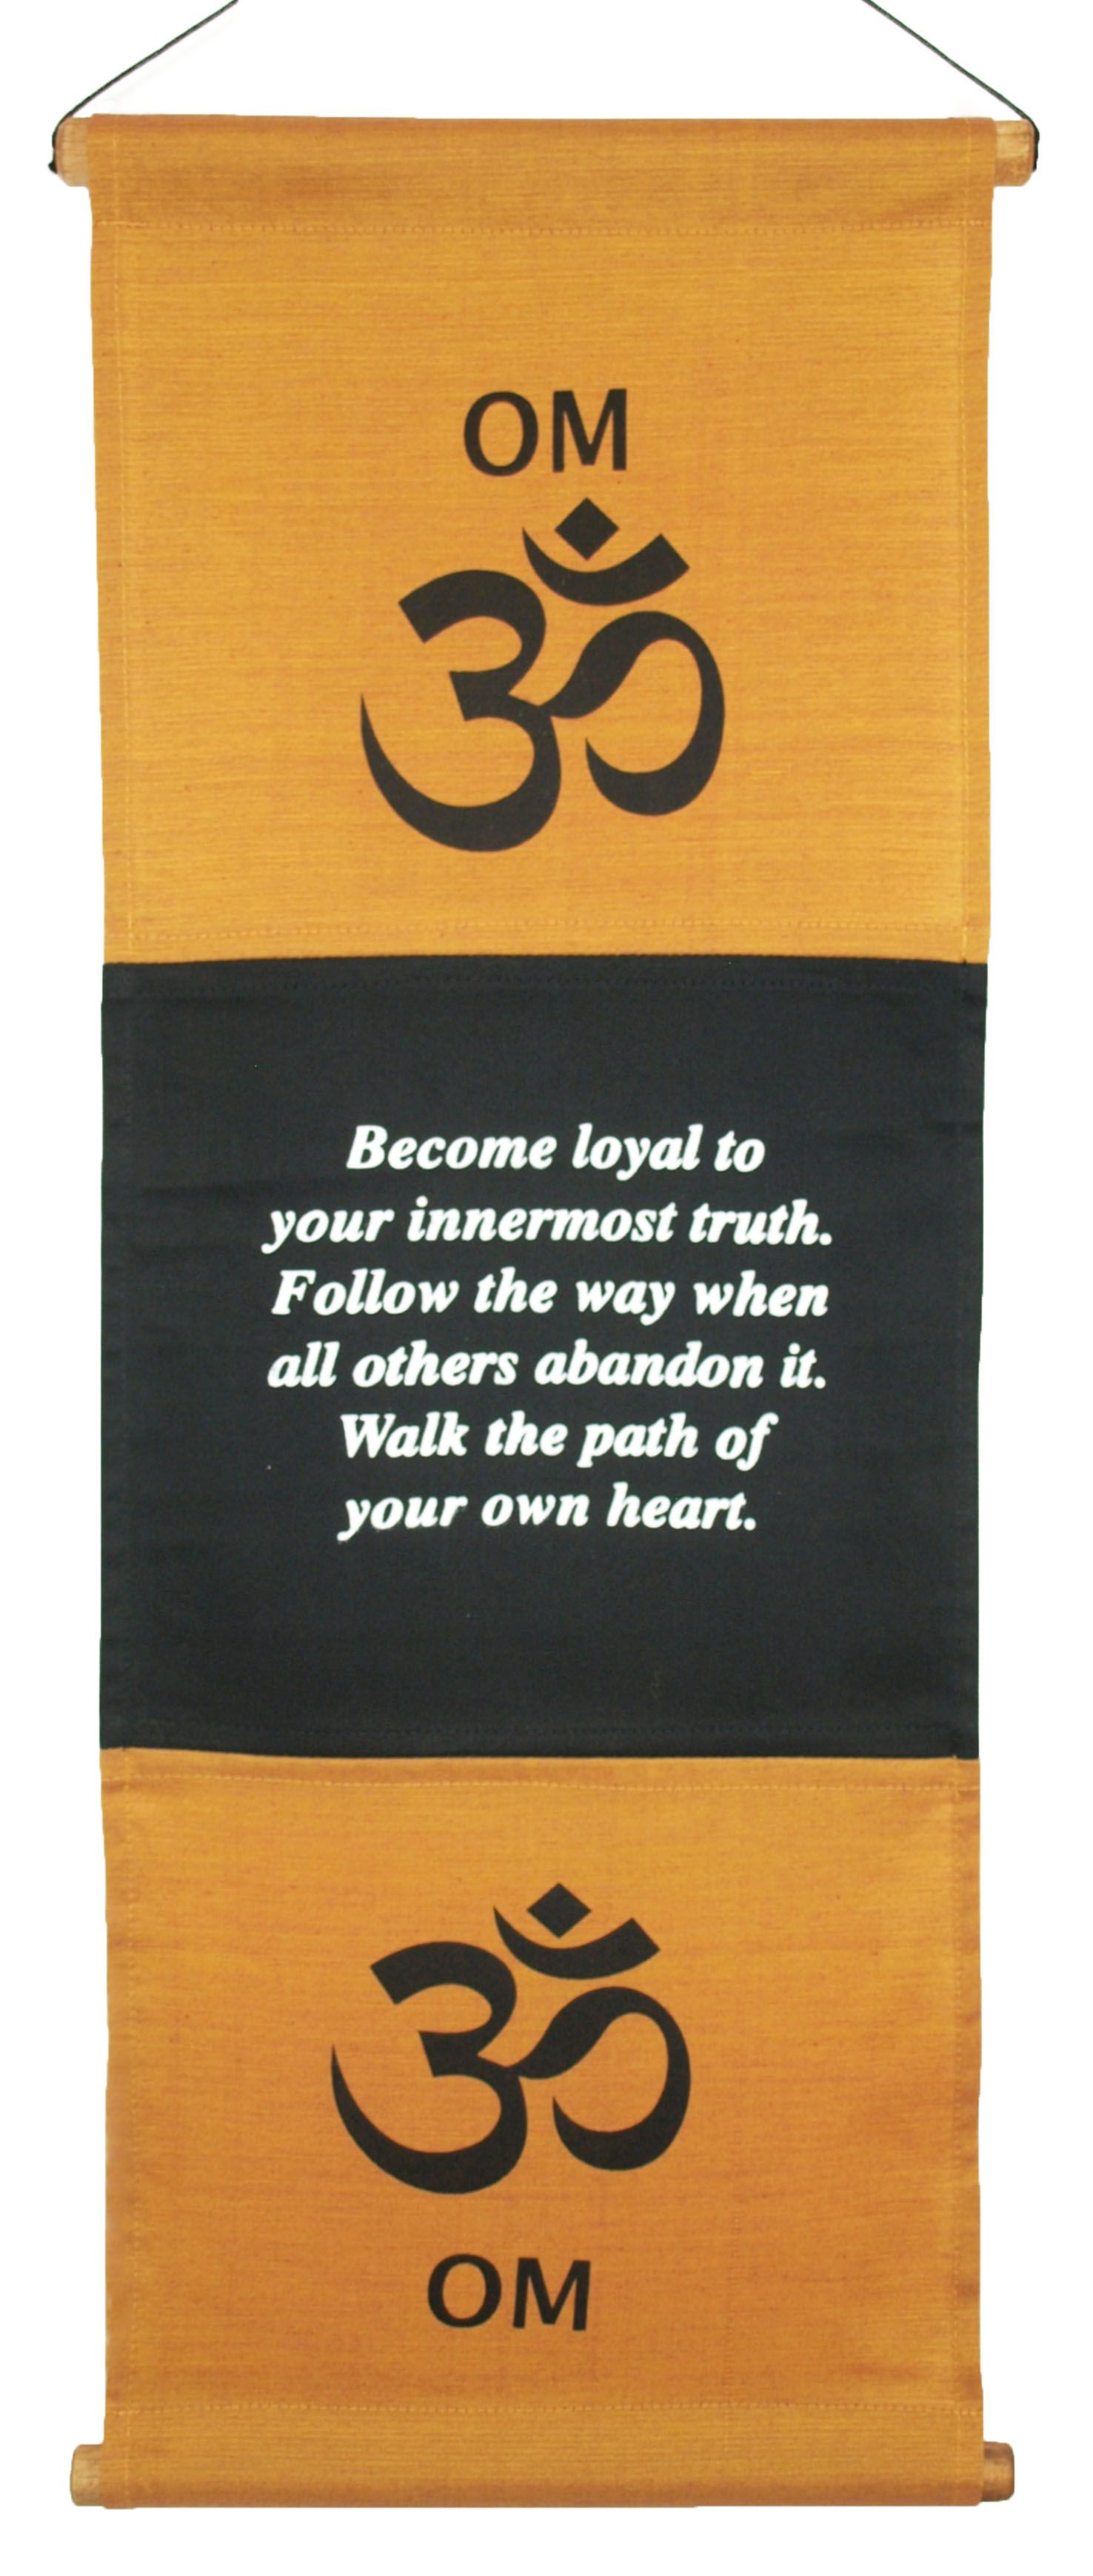 Loyal Innermost Truth. Follow